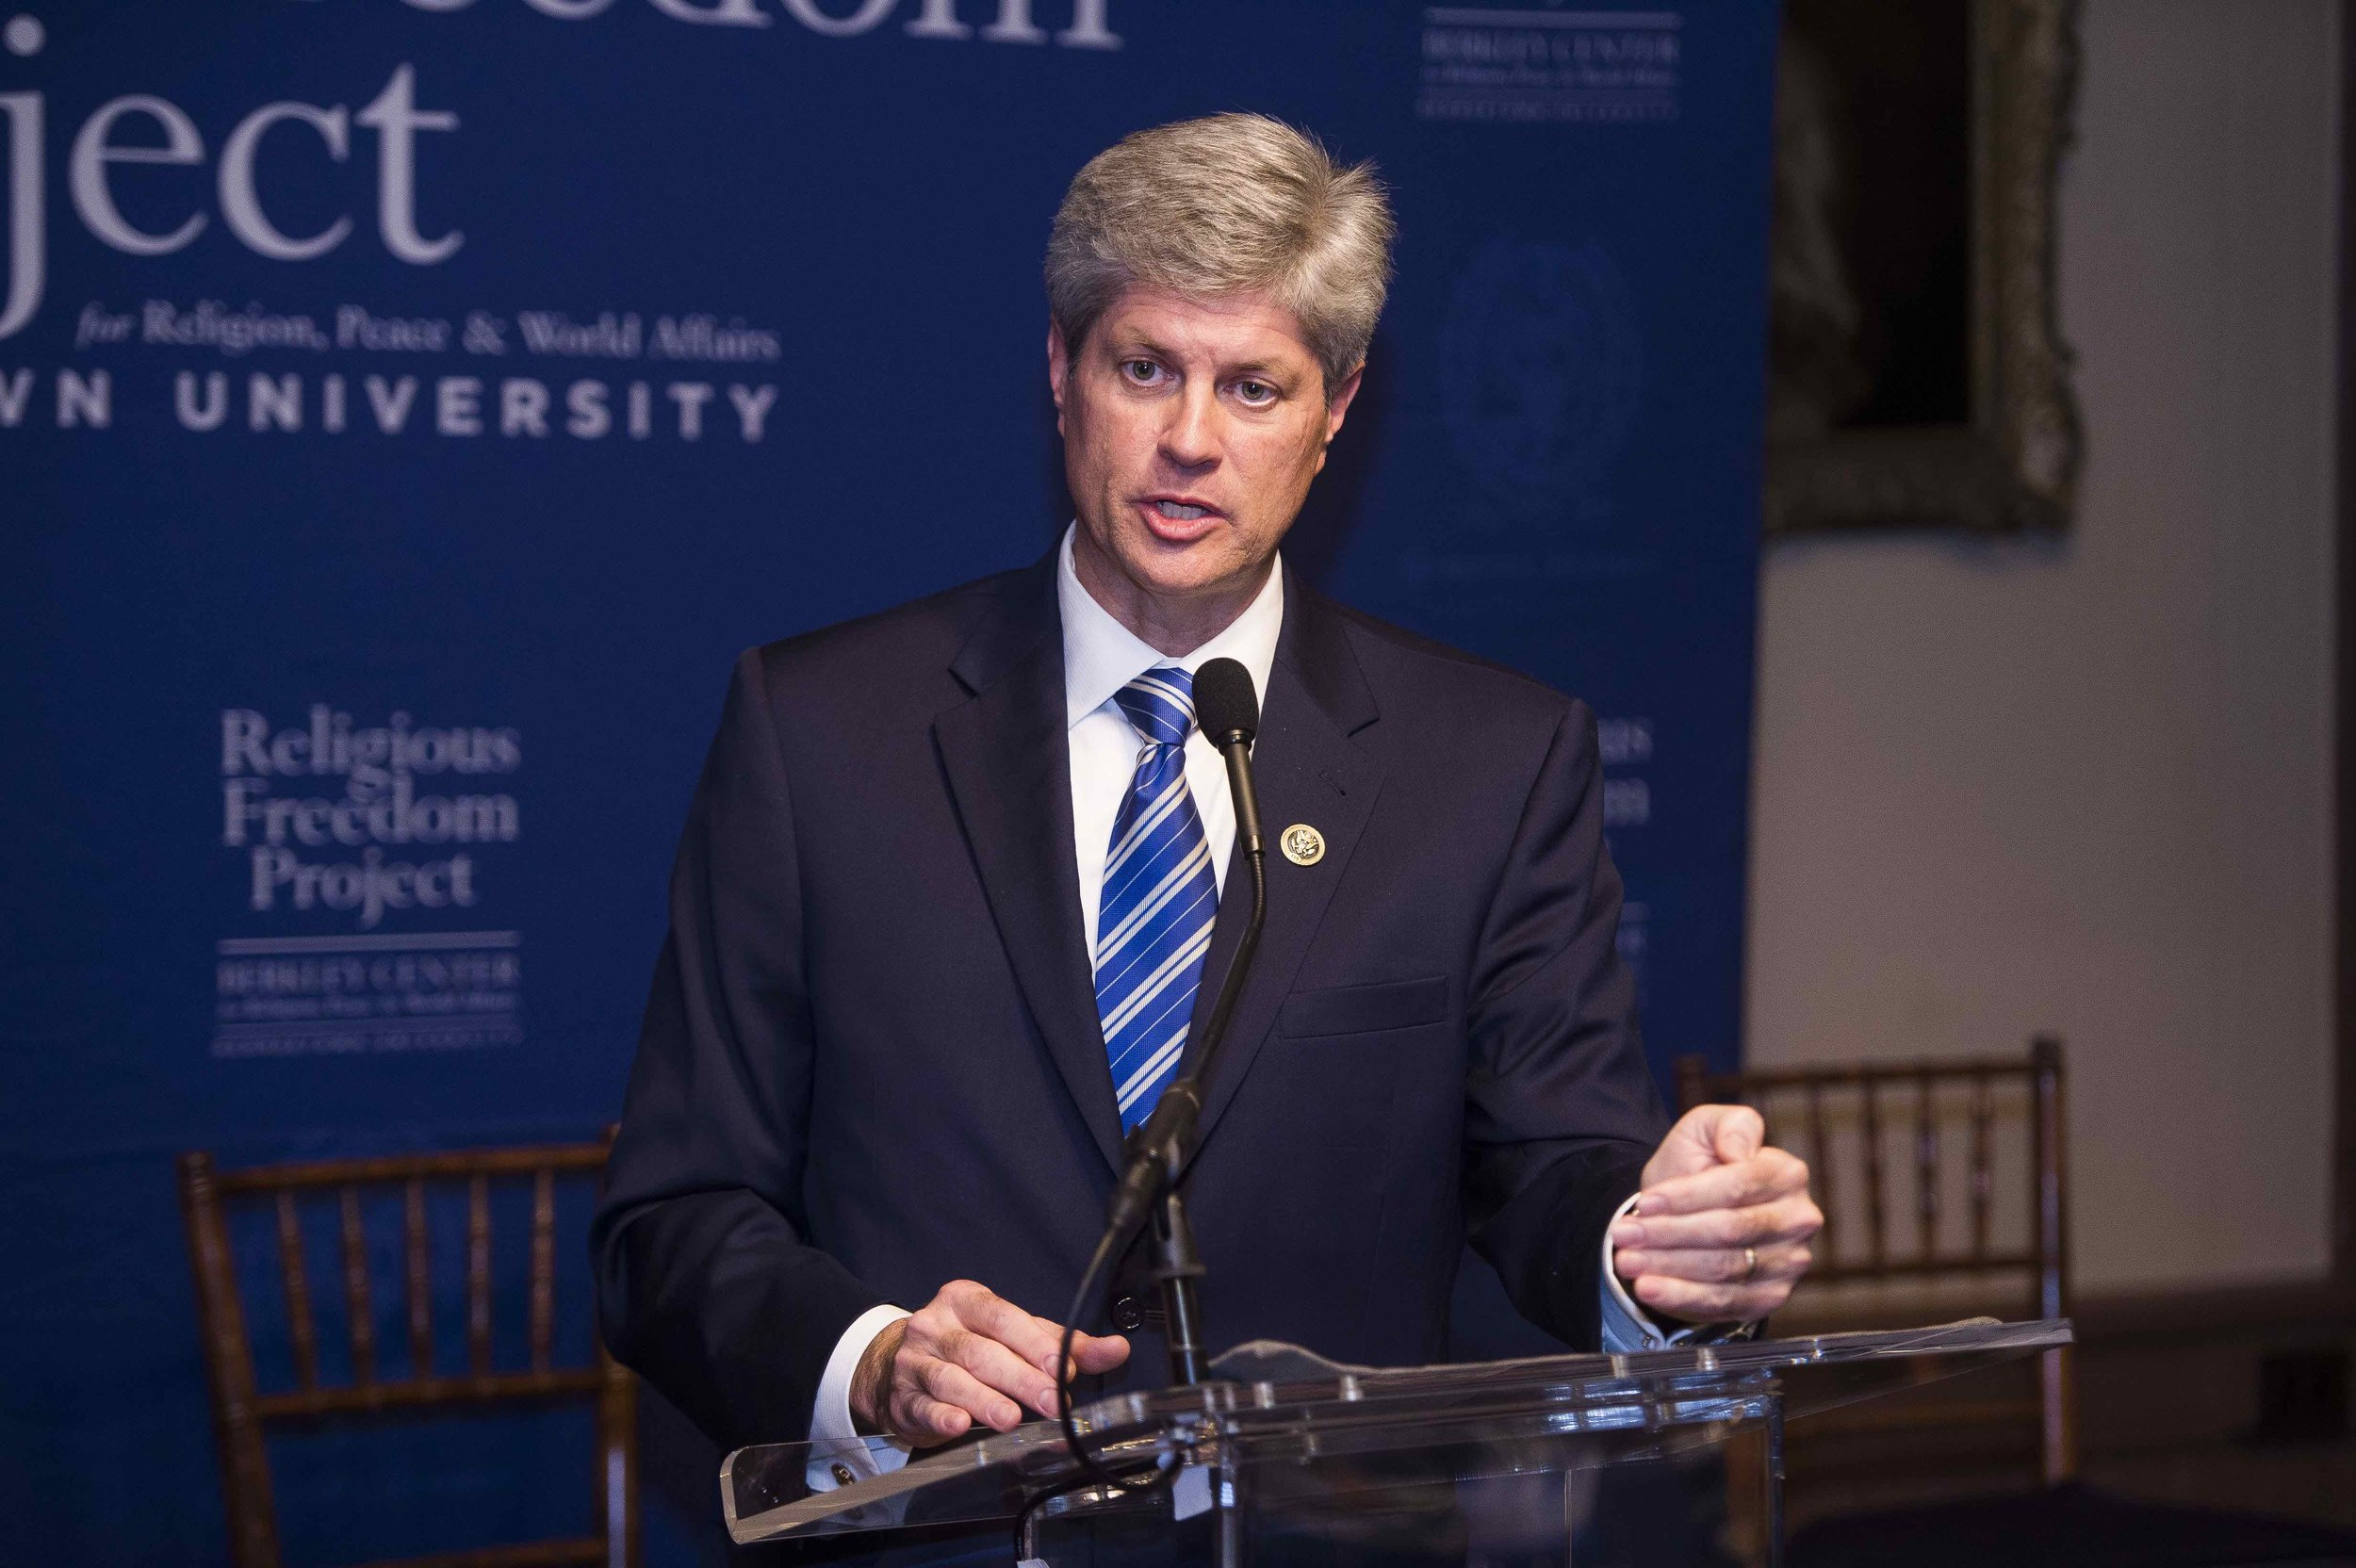 Representative Jeff Fortenberry